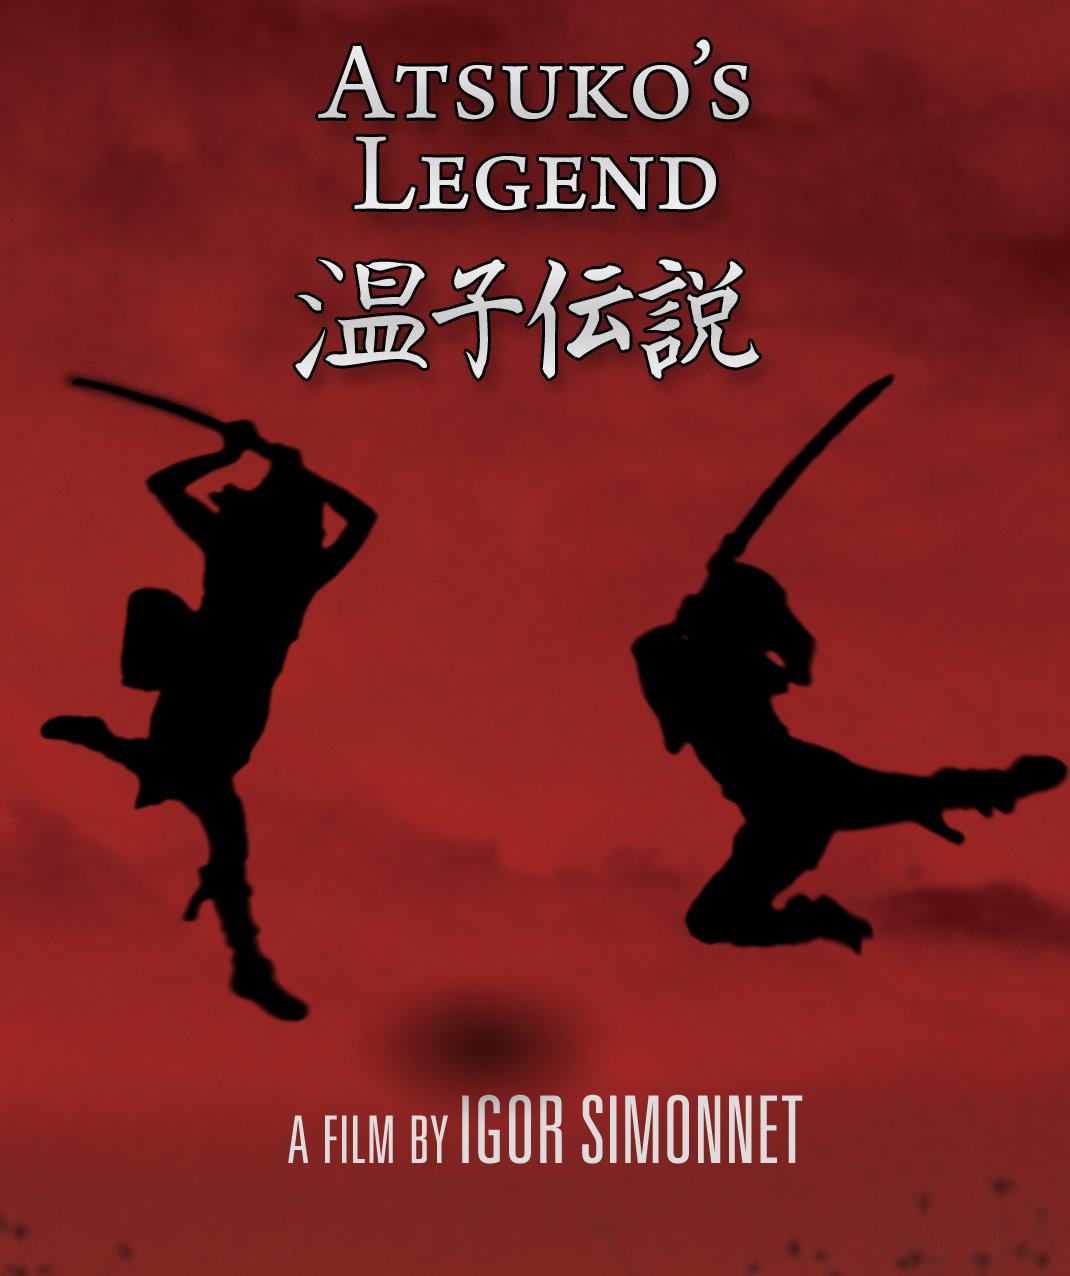 Atsuko's Legend malayalam movie download